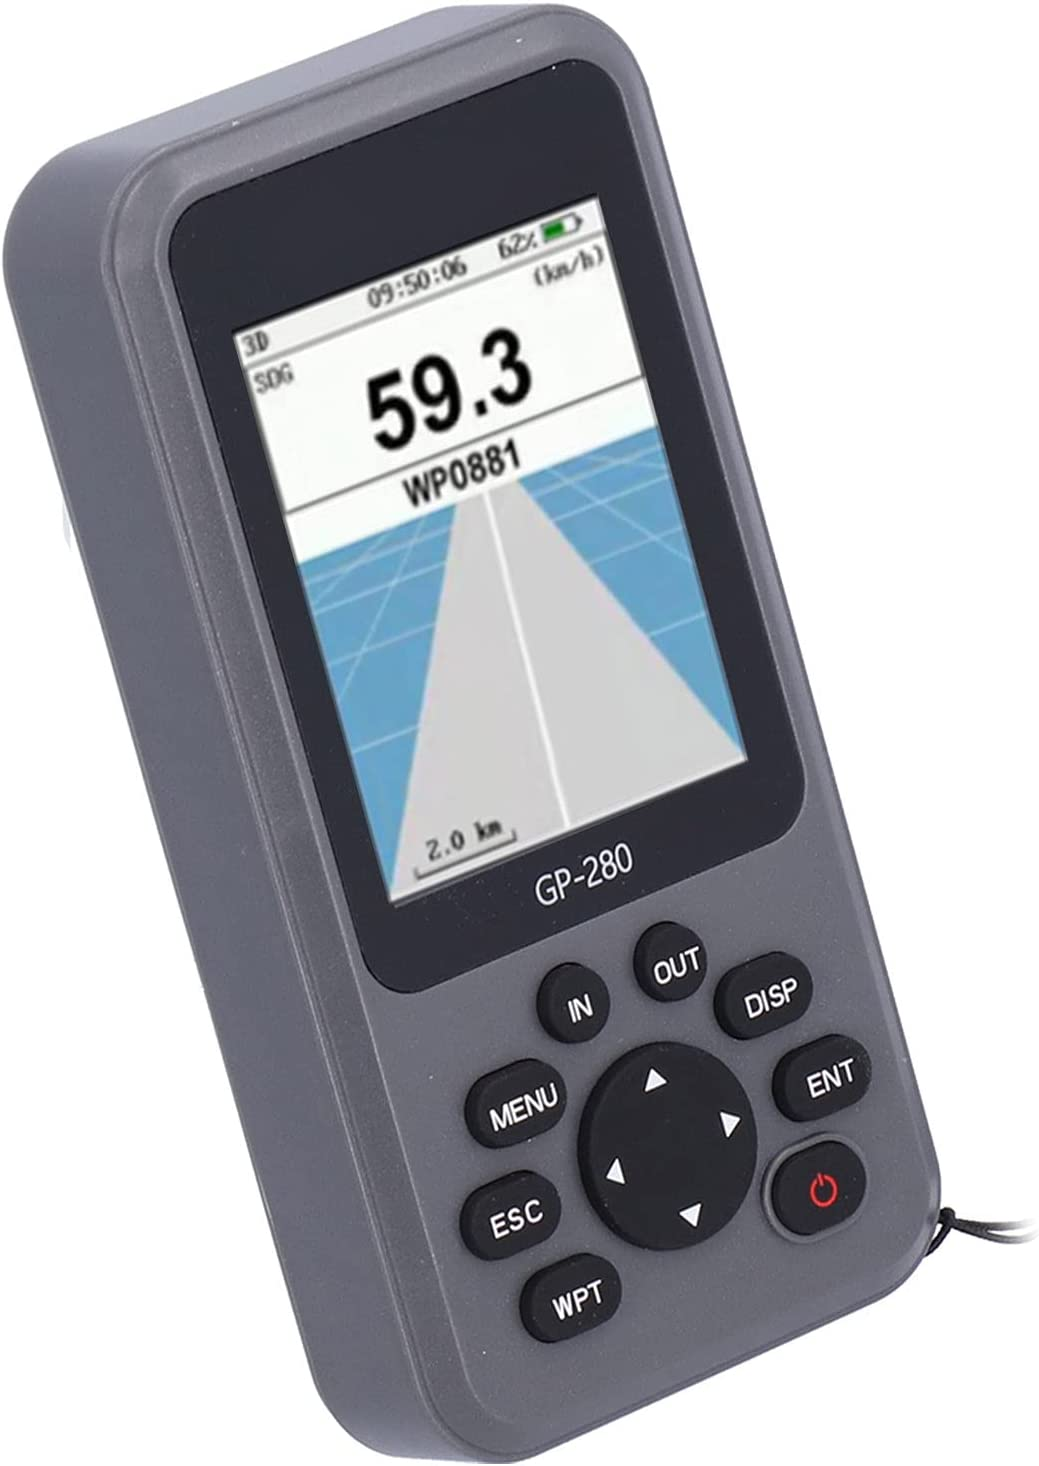 Aramox Handheld Excellence Navigator Rugged GPS Lowest price challenge Latitud